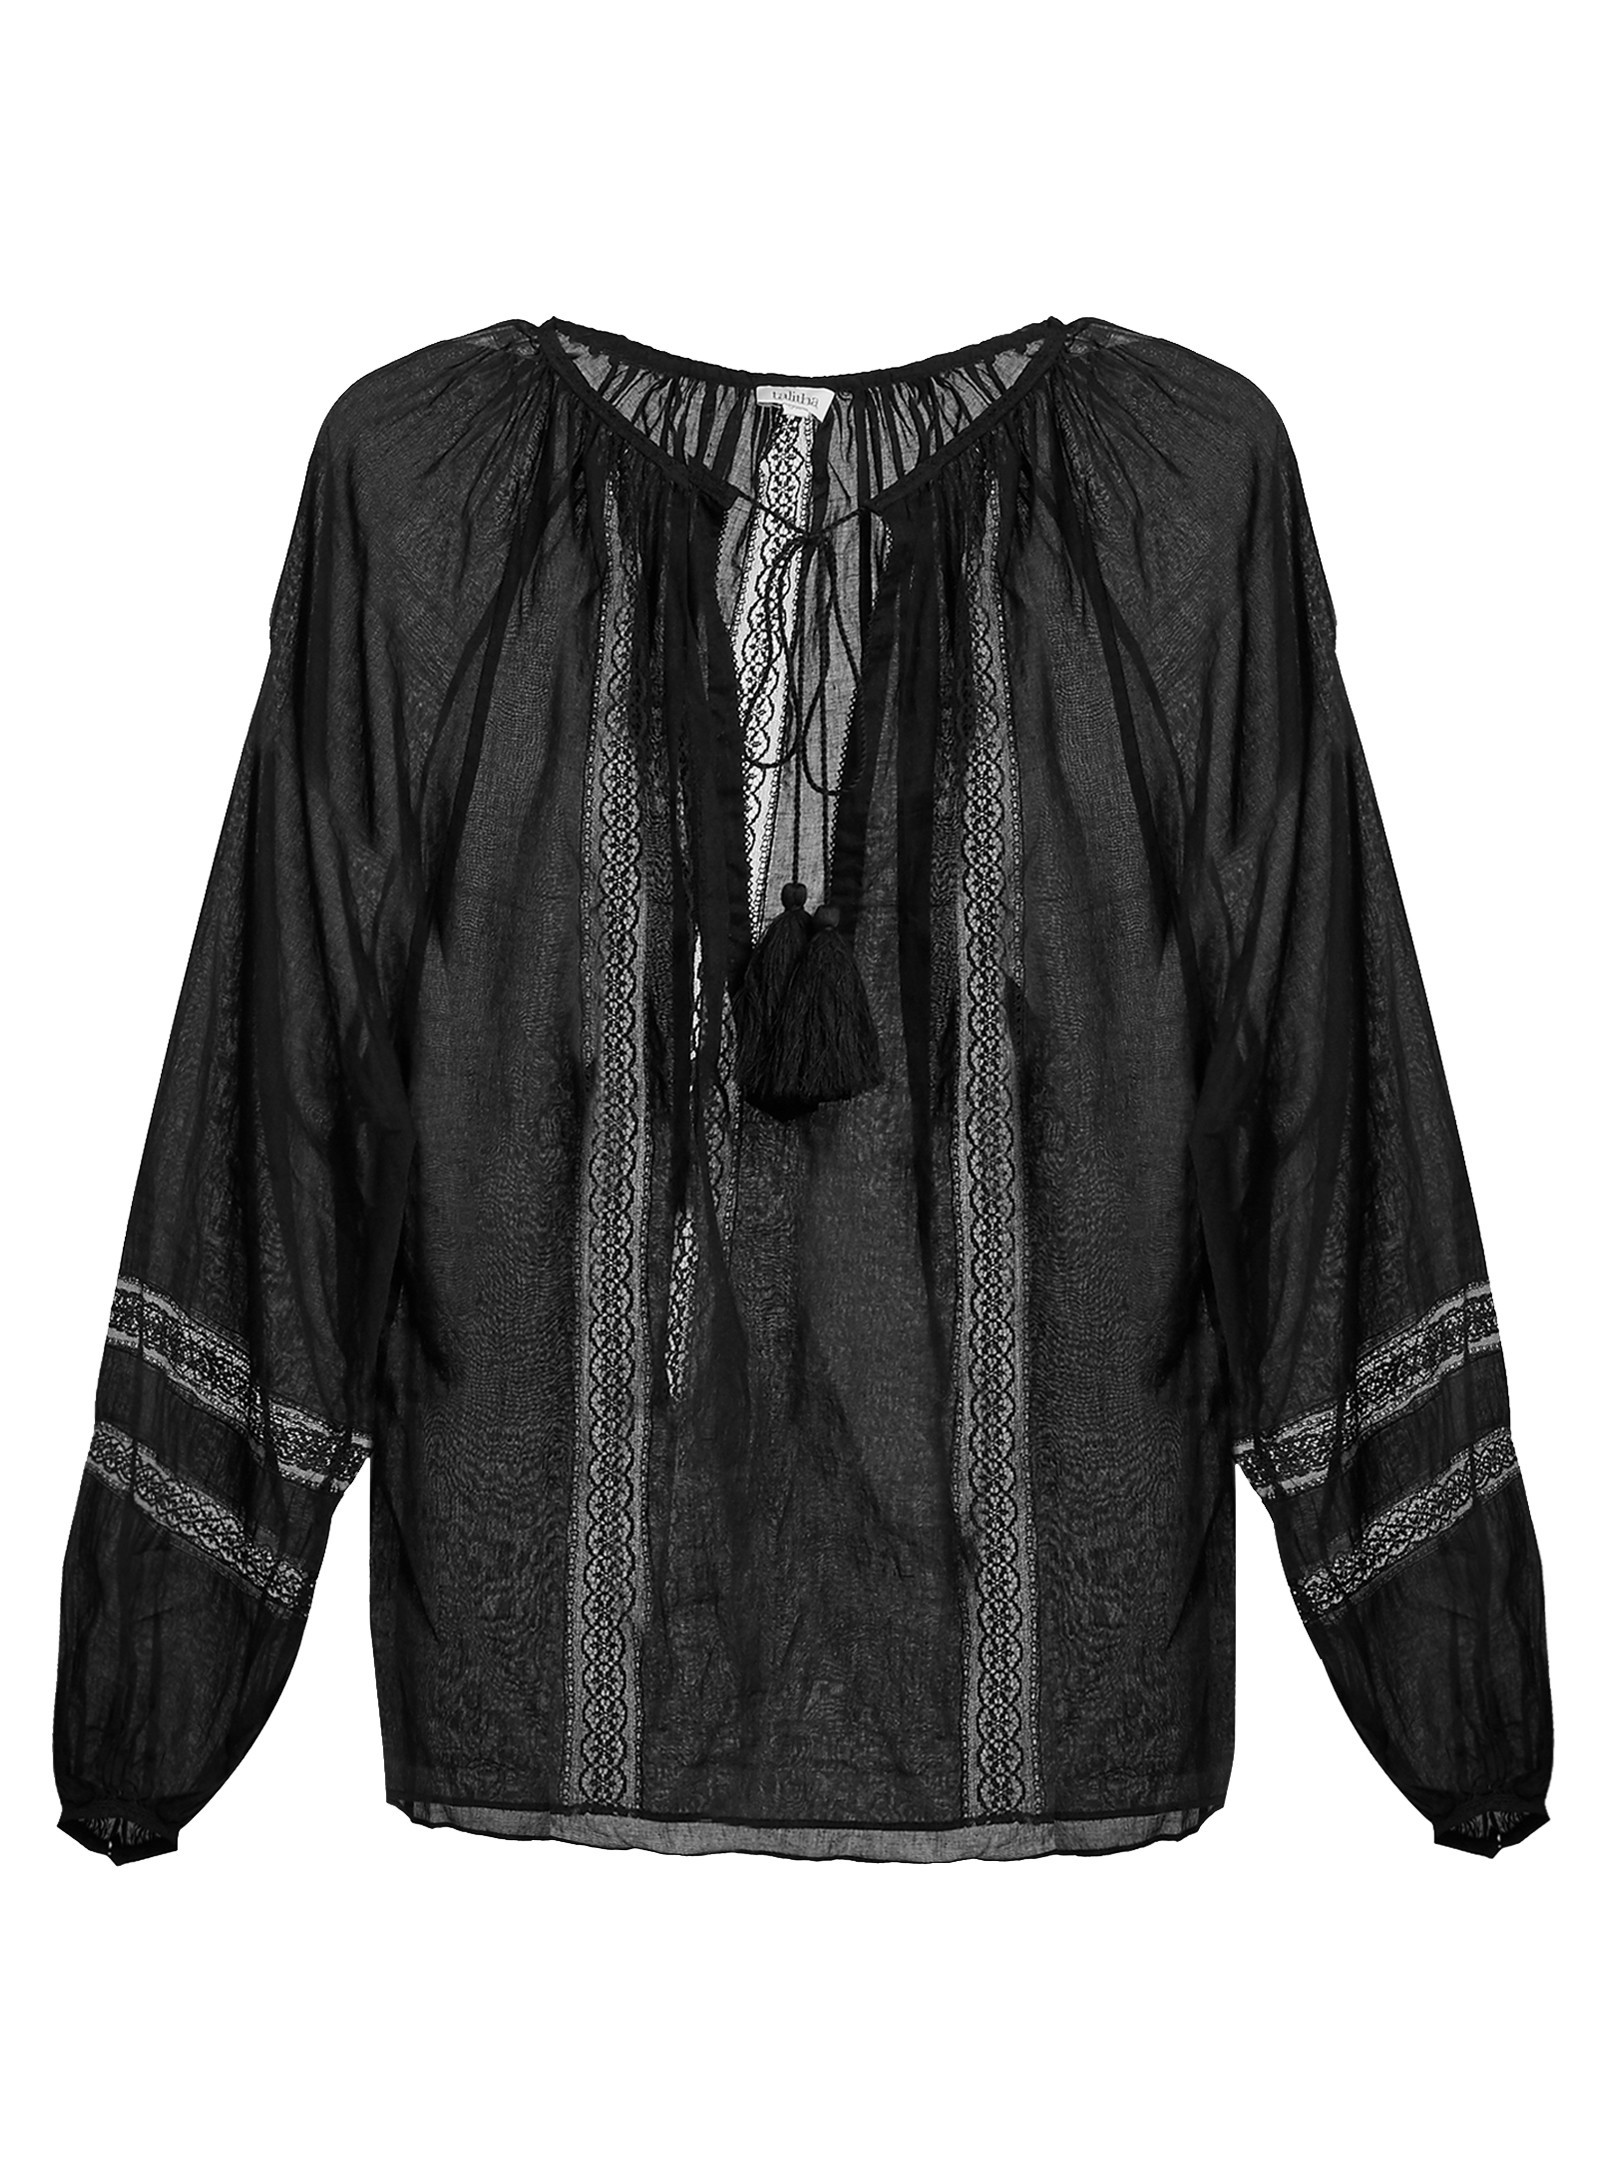 Balenciaga Black Leather Cut-Out Booties sz 39.5   1stdibs.com